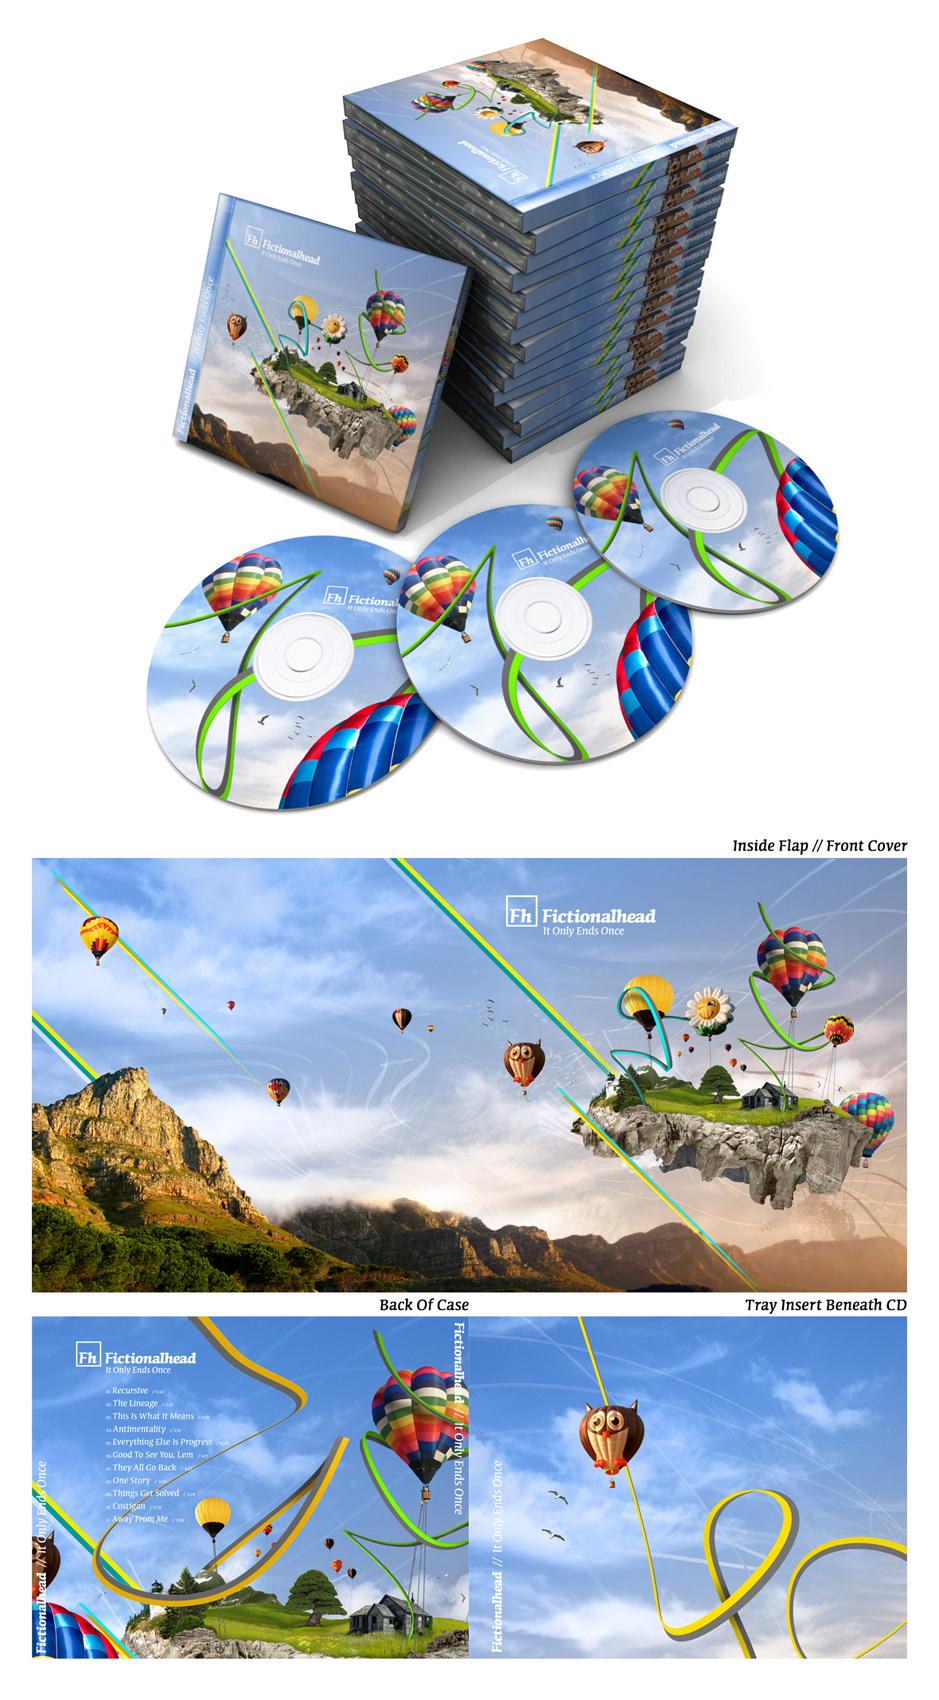 music Album Digital Art  ILLUSTRATION  electronic design